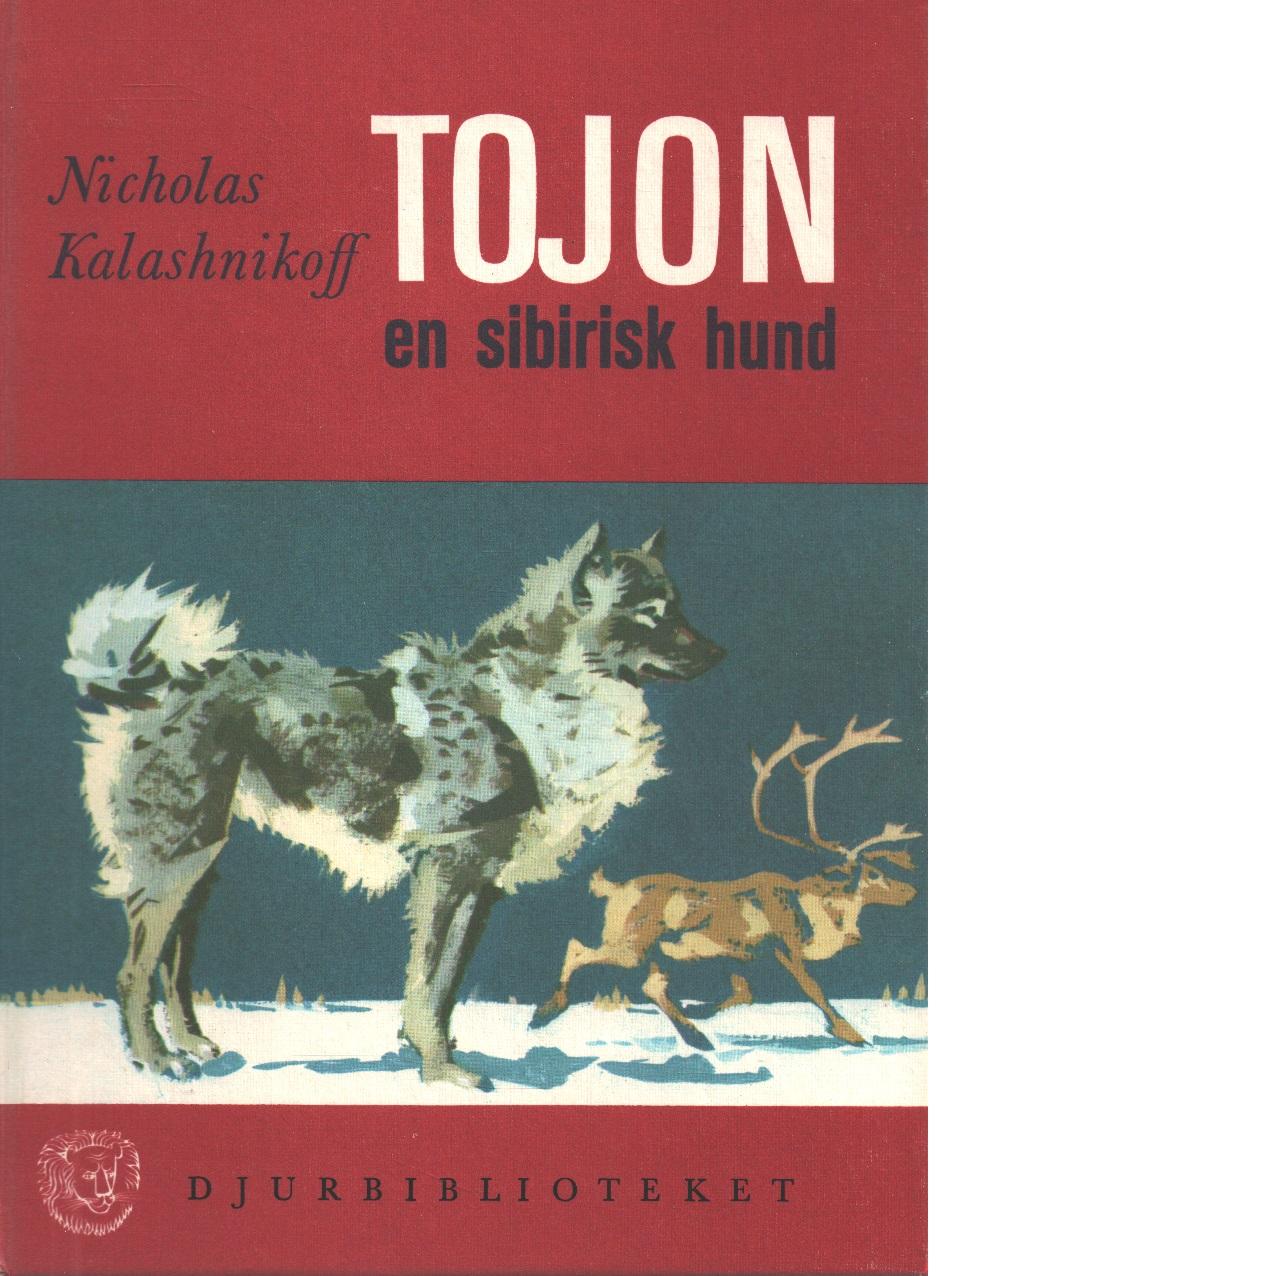 Tojon, en sibirisk hund - Kalashnikoff, Nicholas